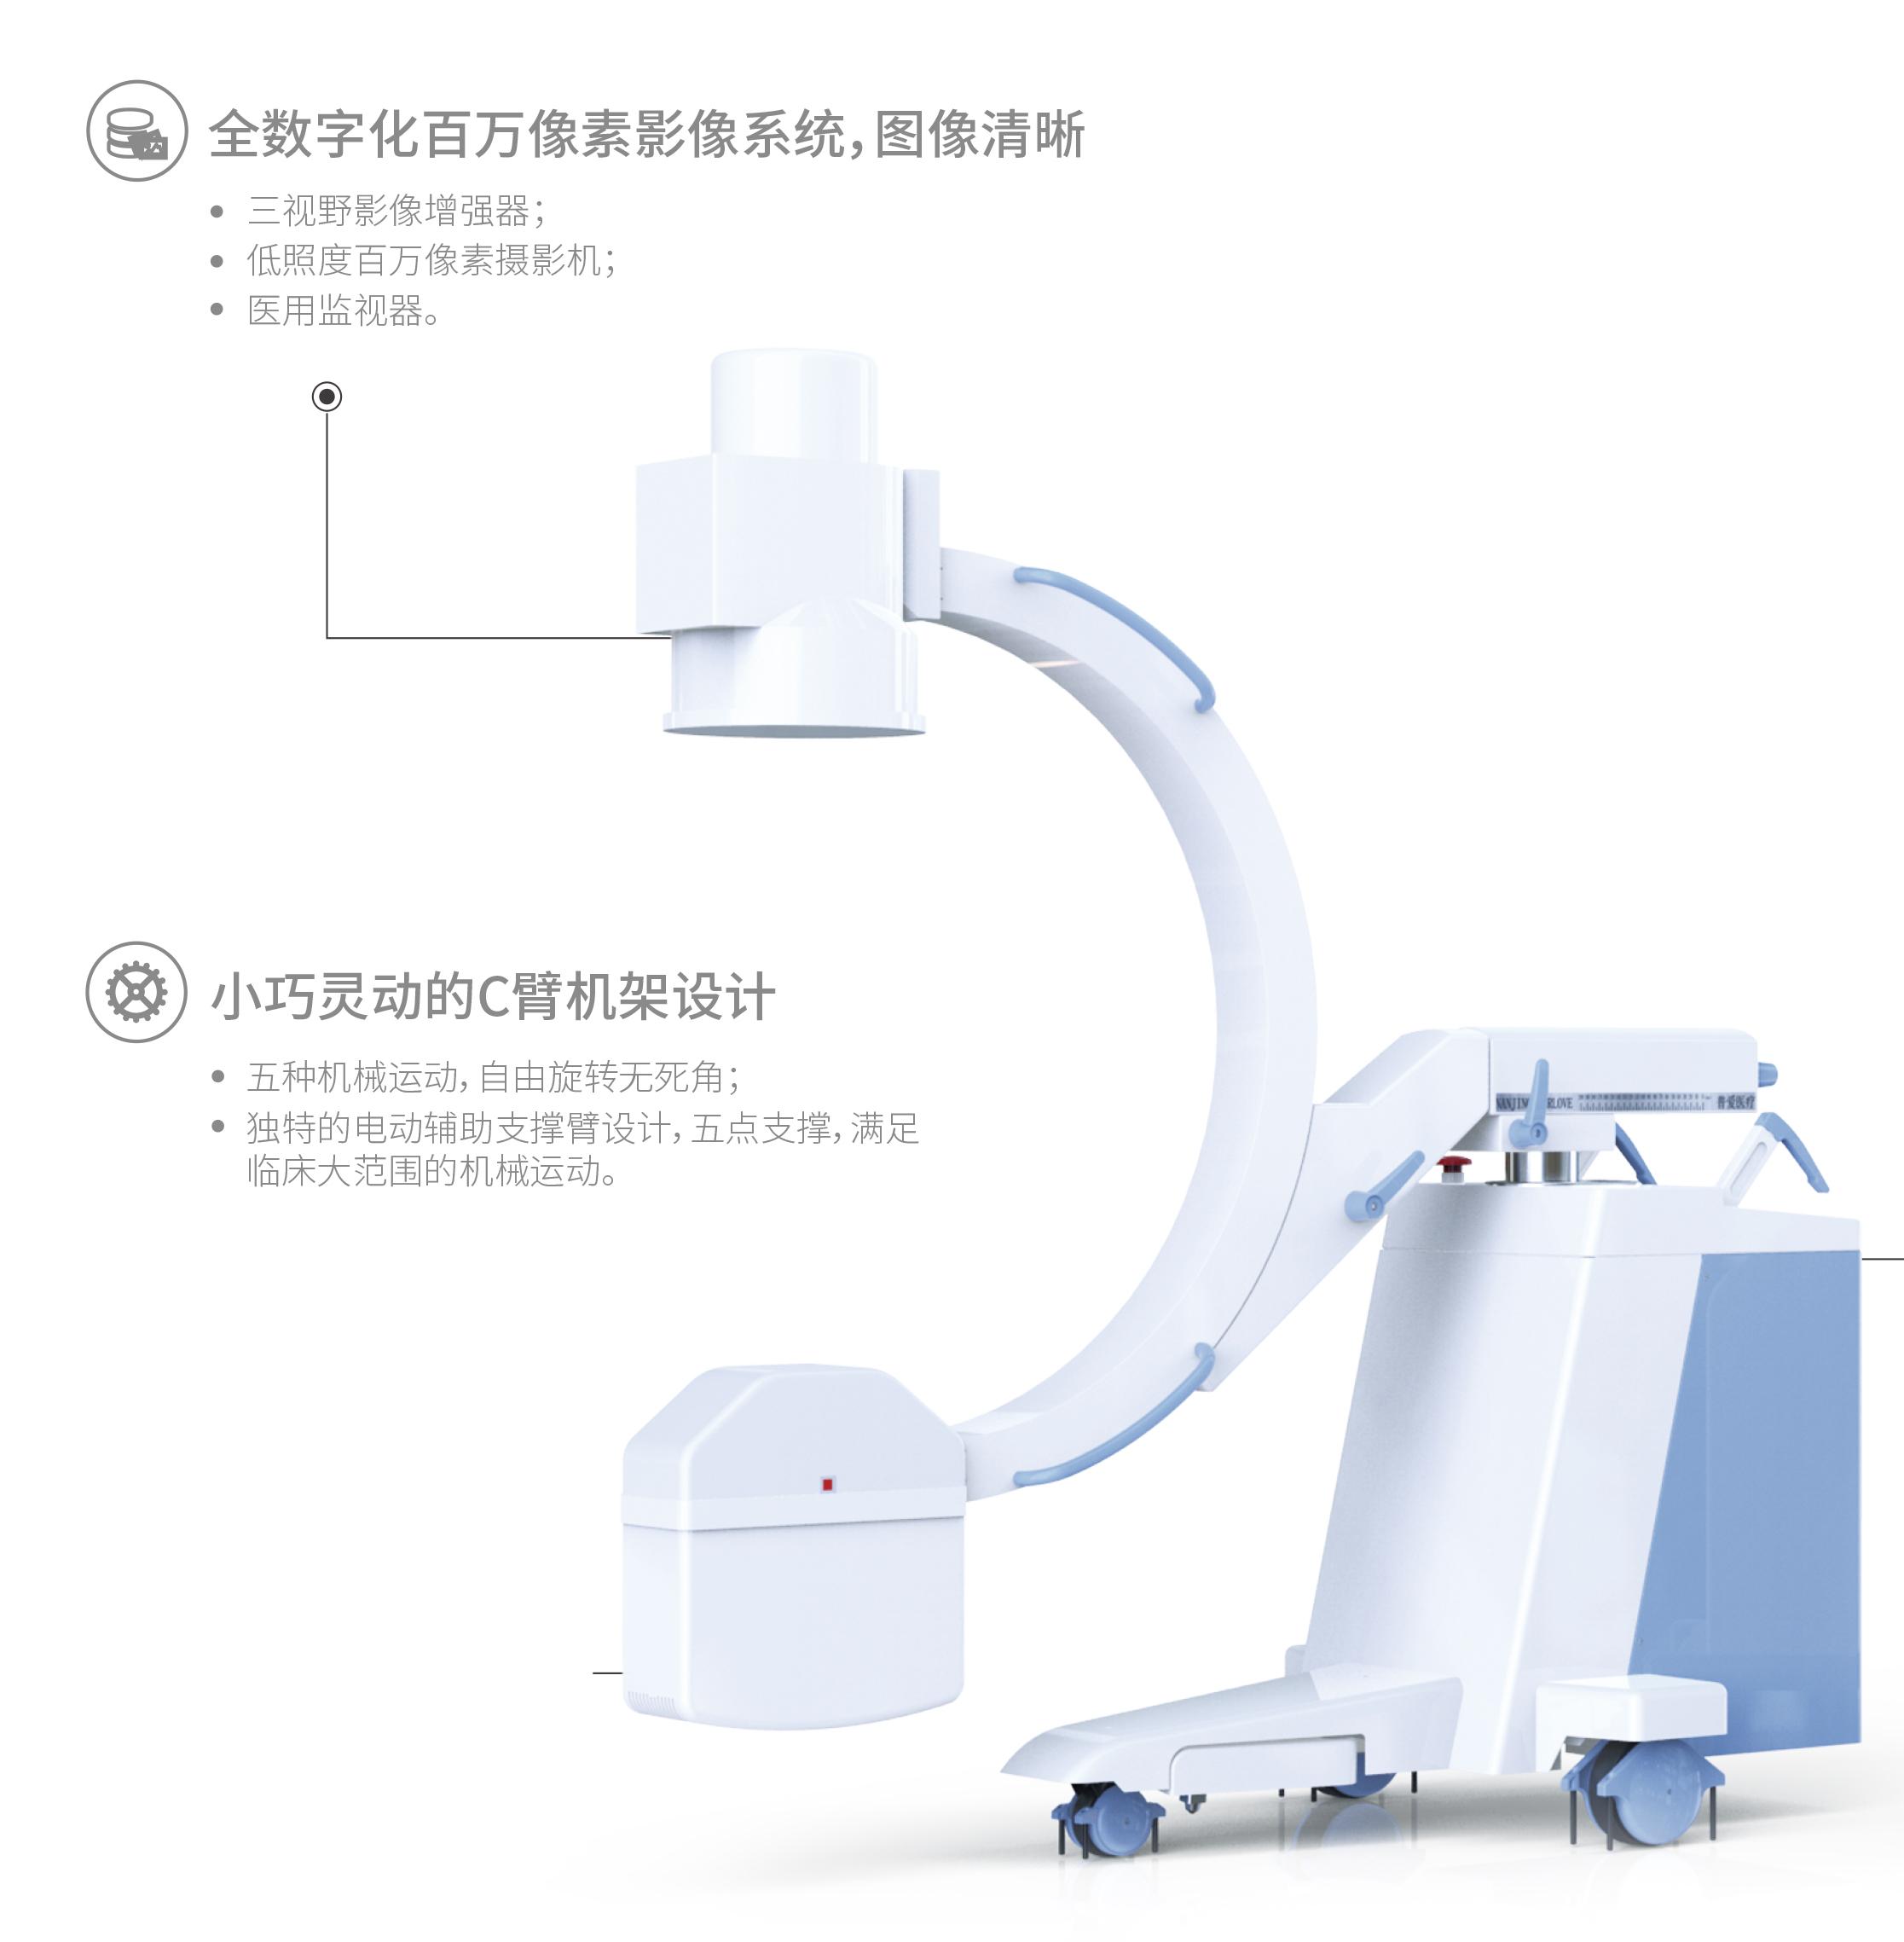 C型臂X光机的数字摄影系统